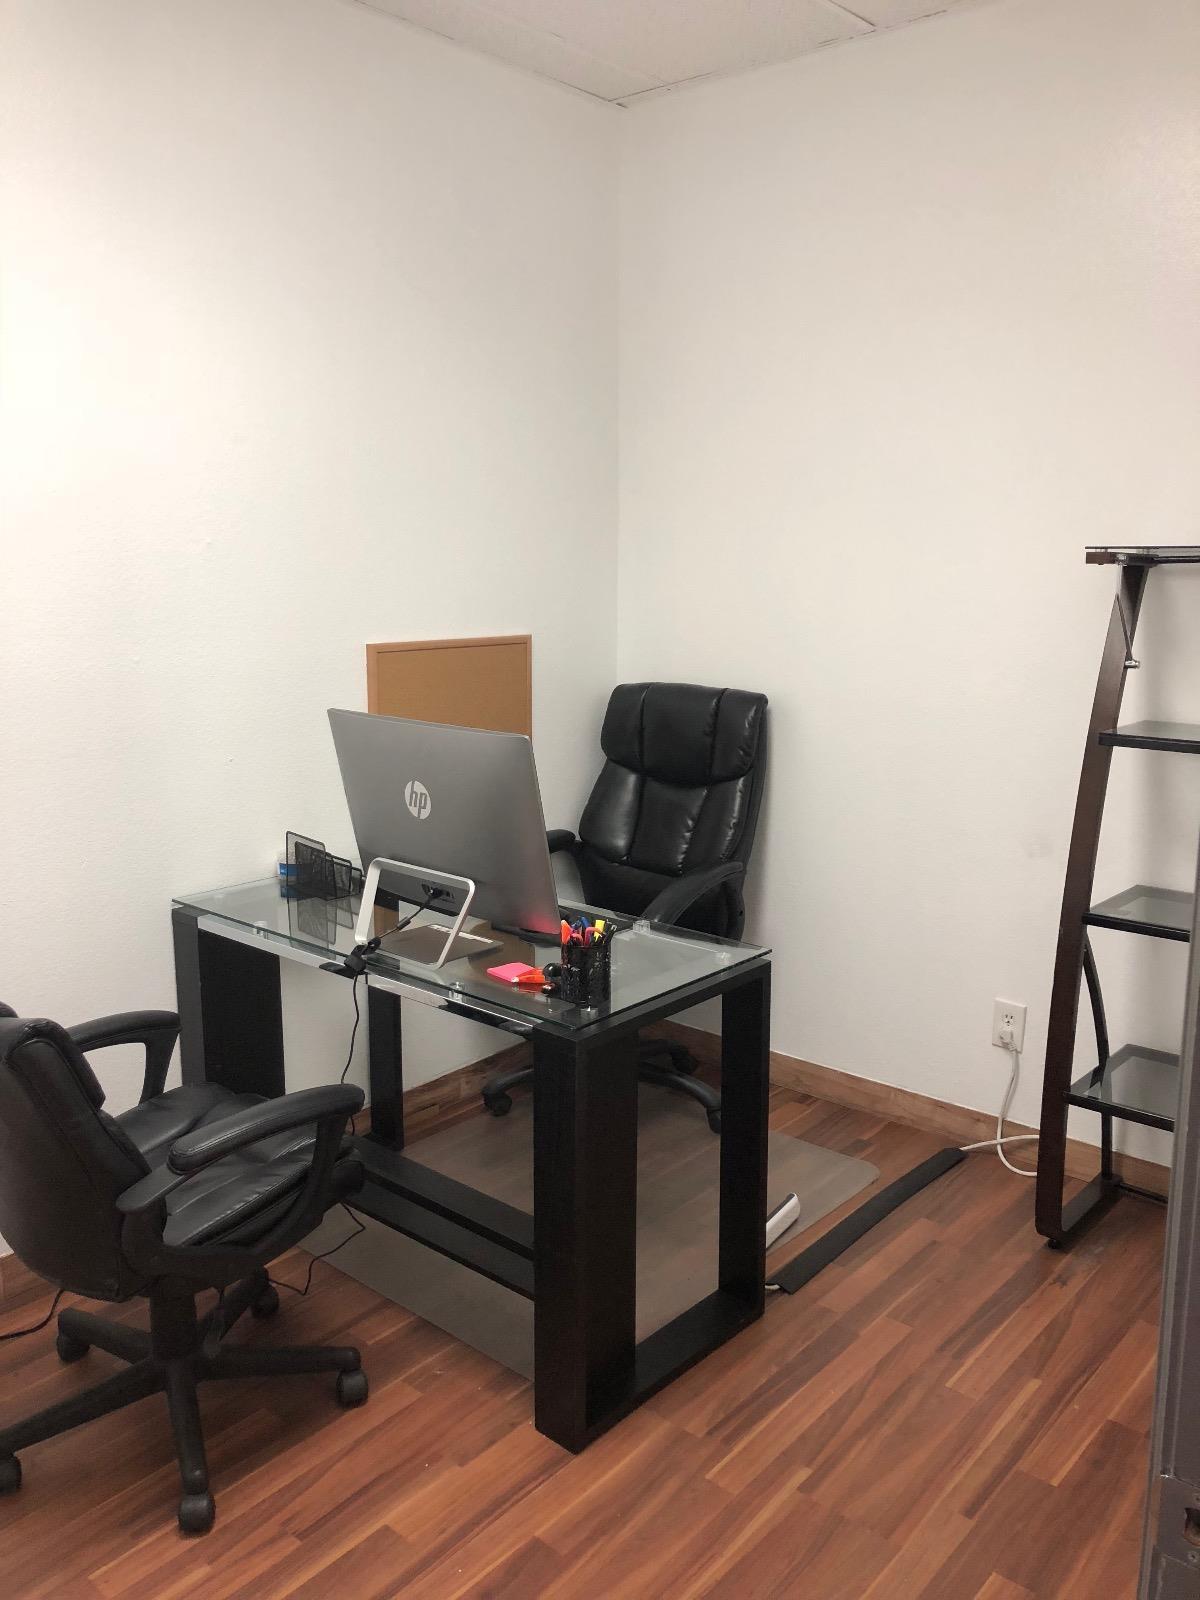 Nova Innovations - Private Office 1 Fully Furnished Desk